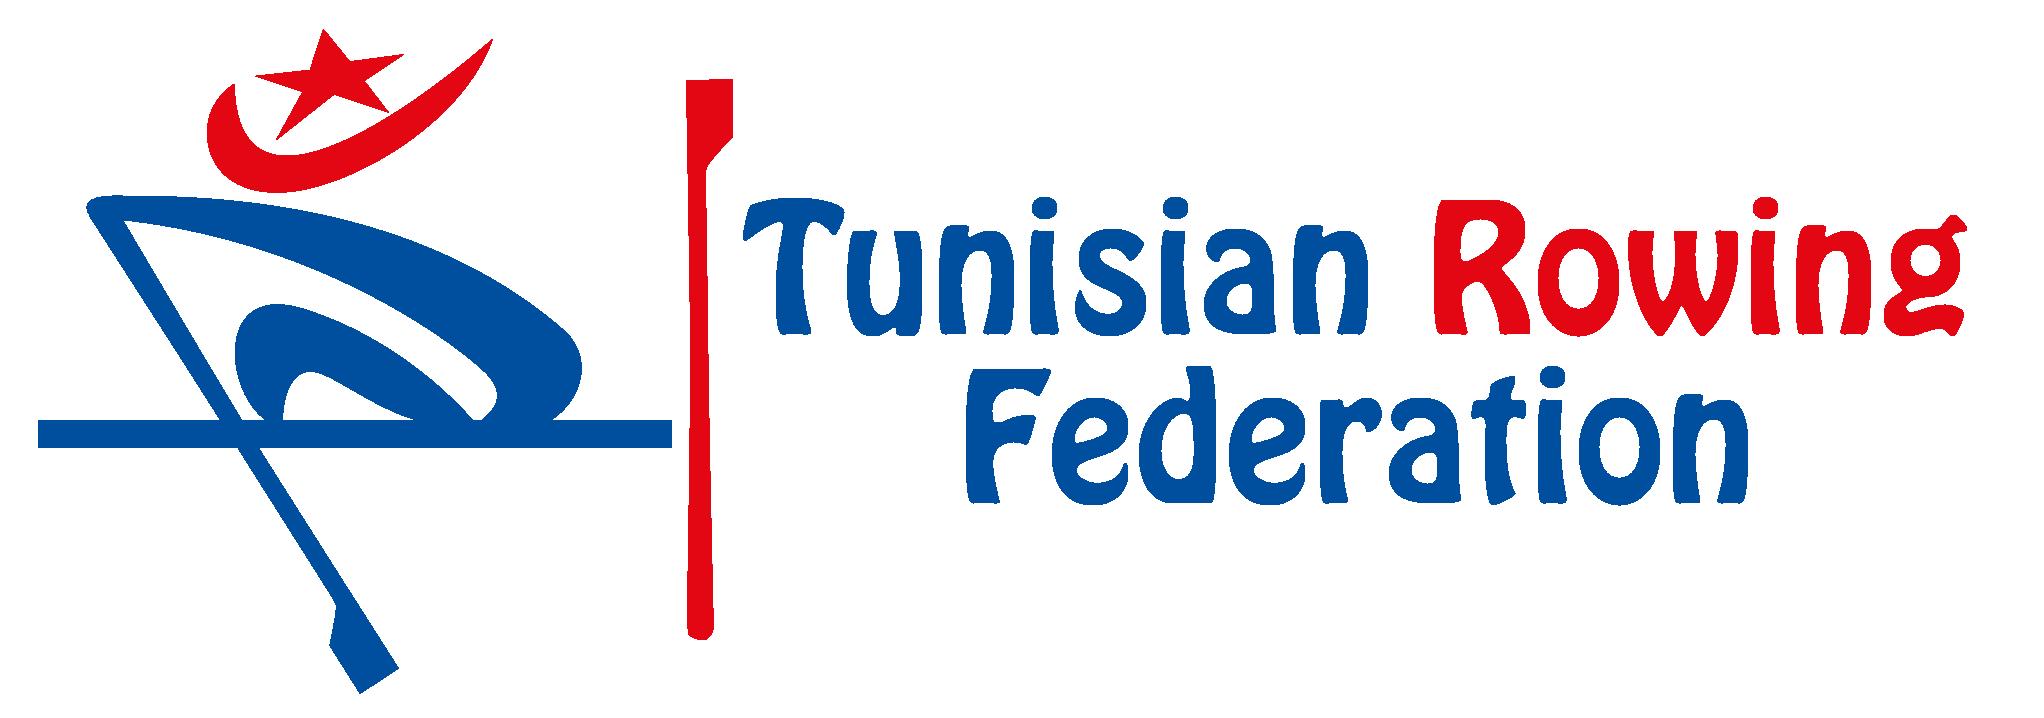 Tunisian Rowing Federation